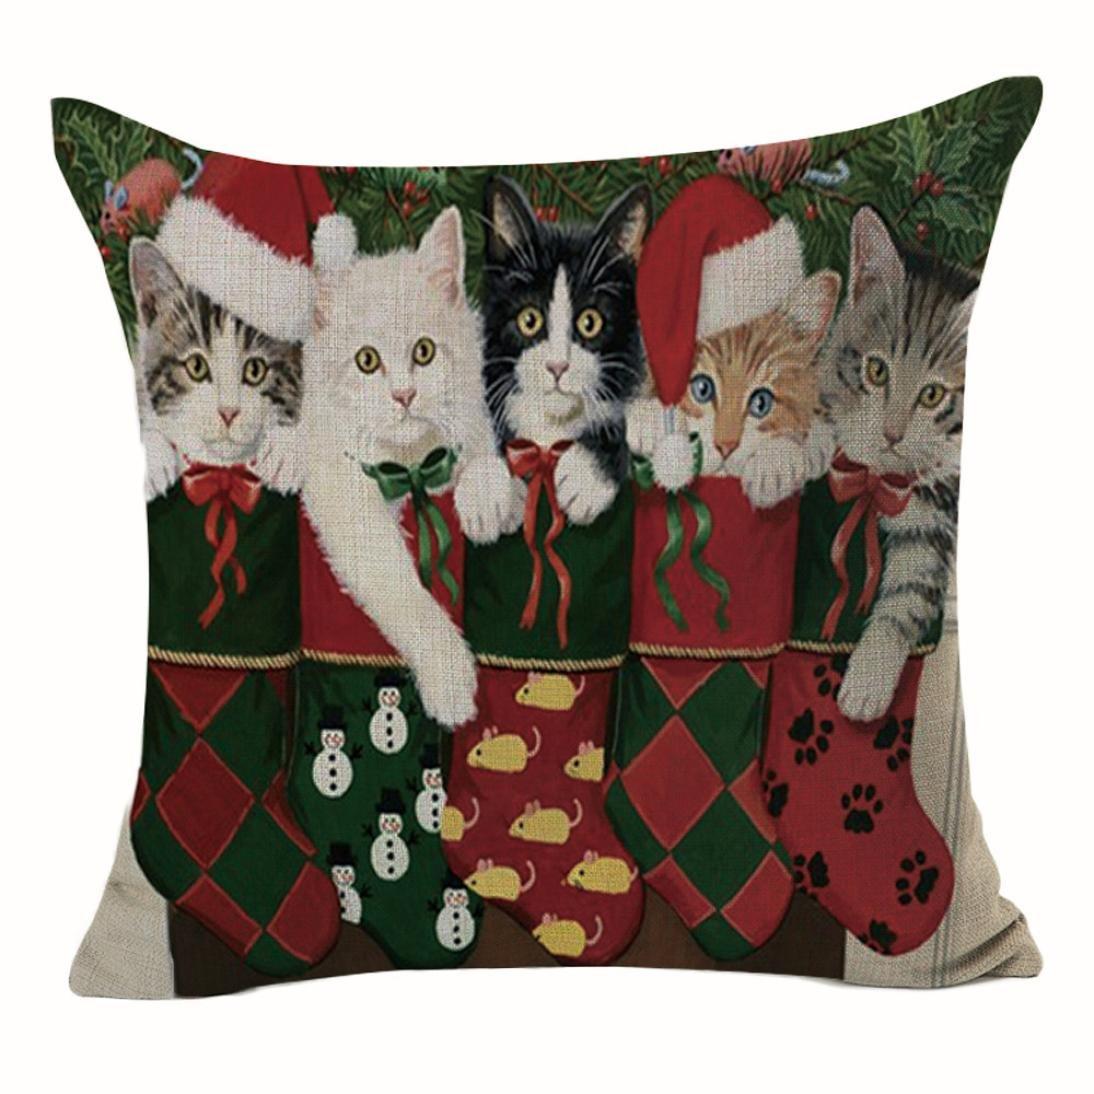 Gotd Merry Christmas Pillow Case Cute Cat Xmas 18 x 18 Cushion Cover Merry Chritmas Home Decor Design Throw Pillow Cover Pillow Case 18 x 18 Inch ...